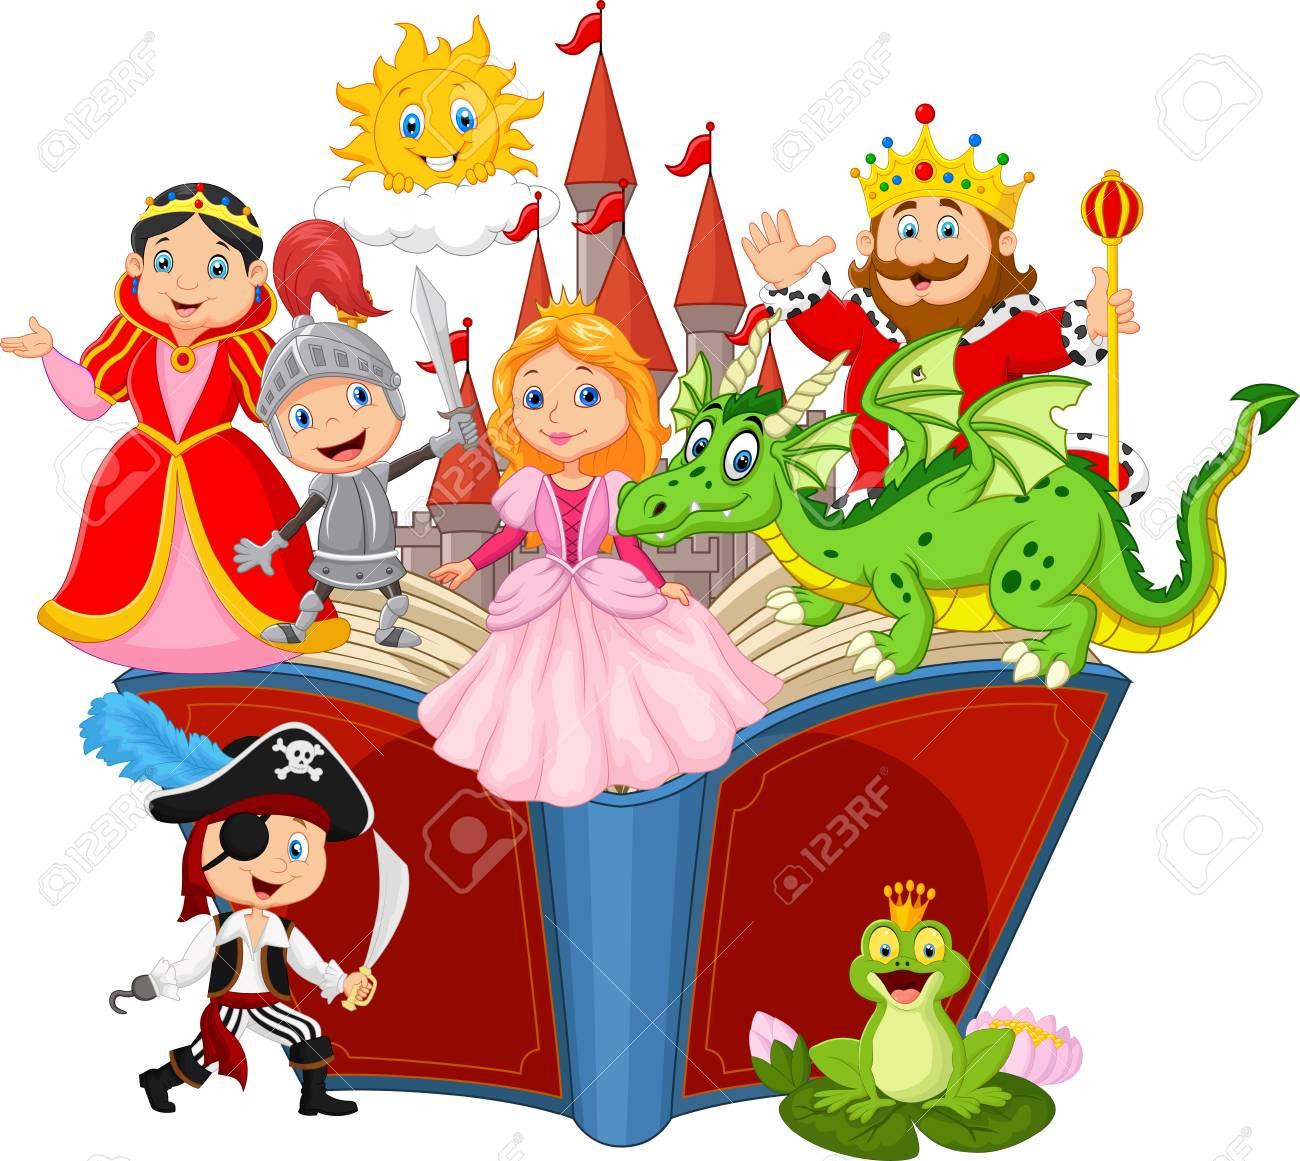 Imagination in a children fairy tail fantasy book - 96375884